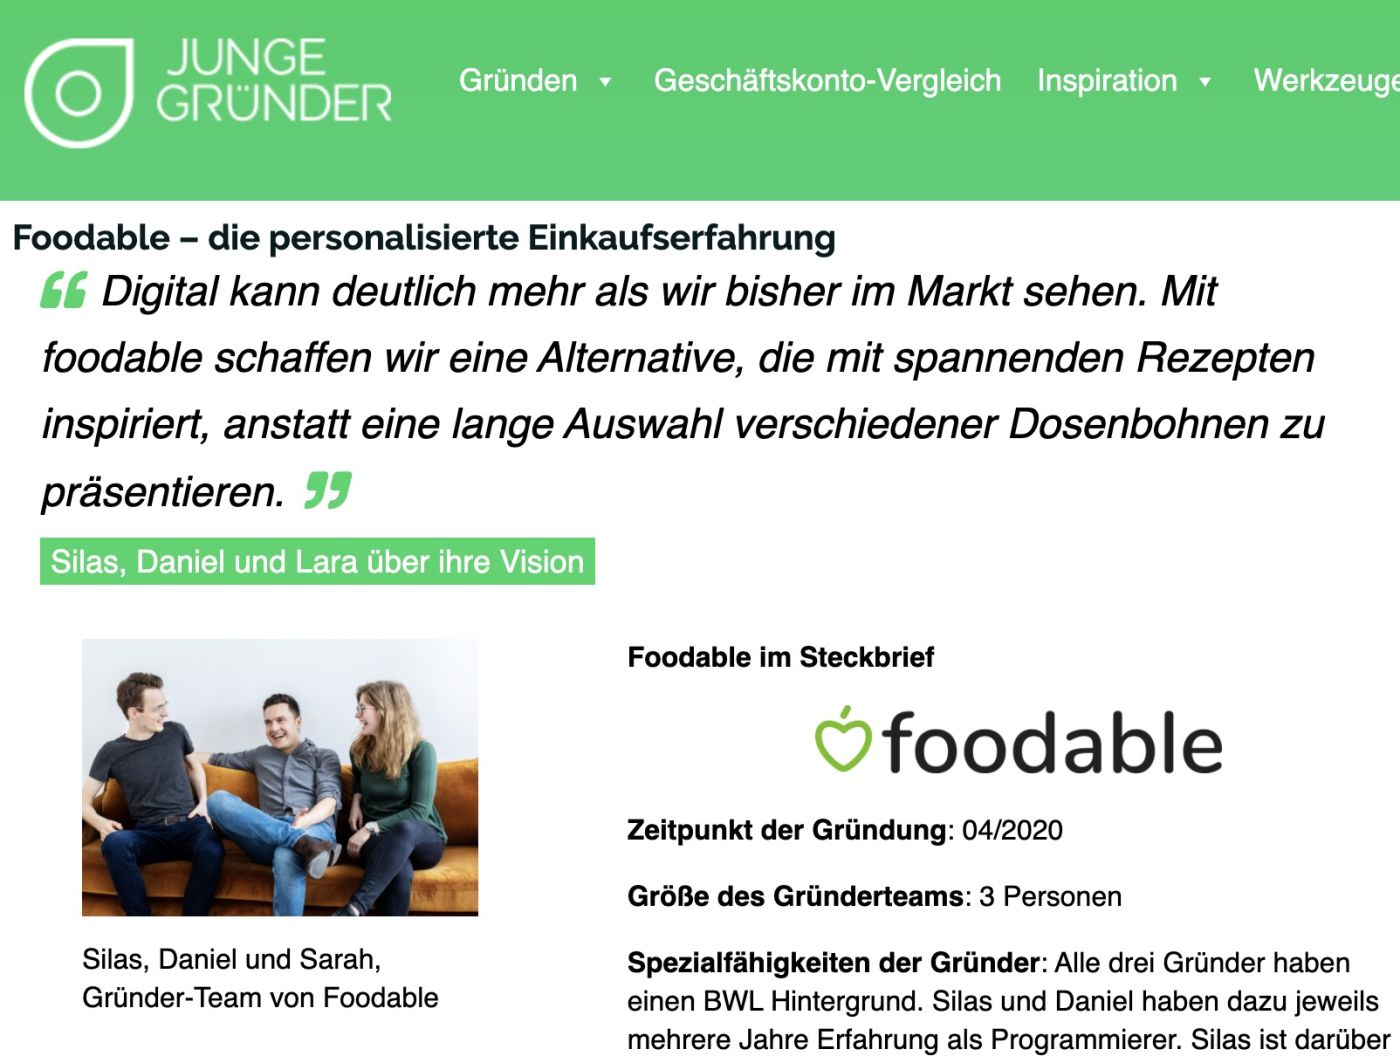 foodable®-Steckbrief bei Junge Gruender